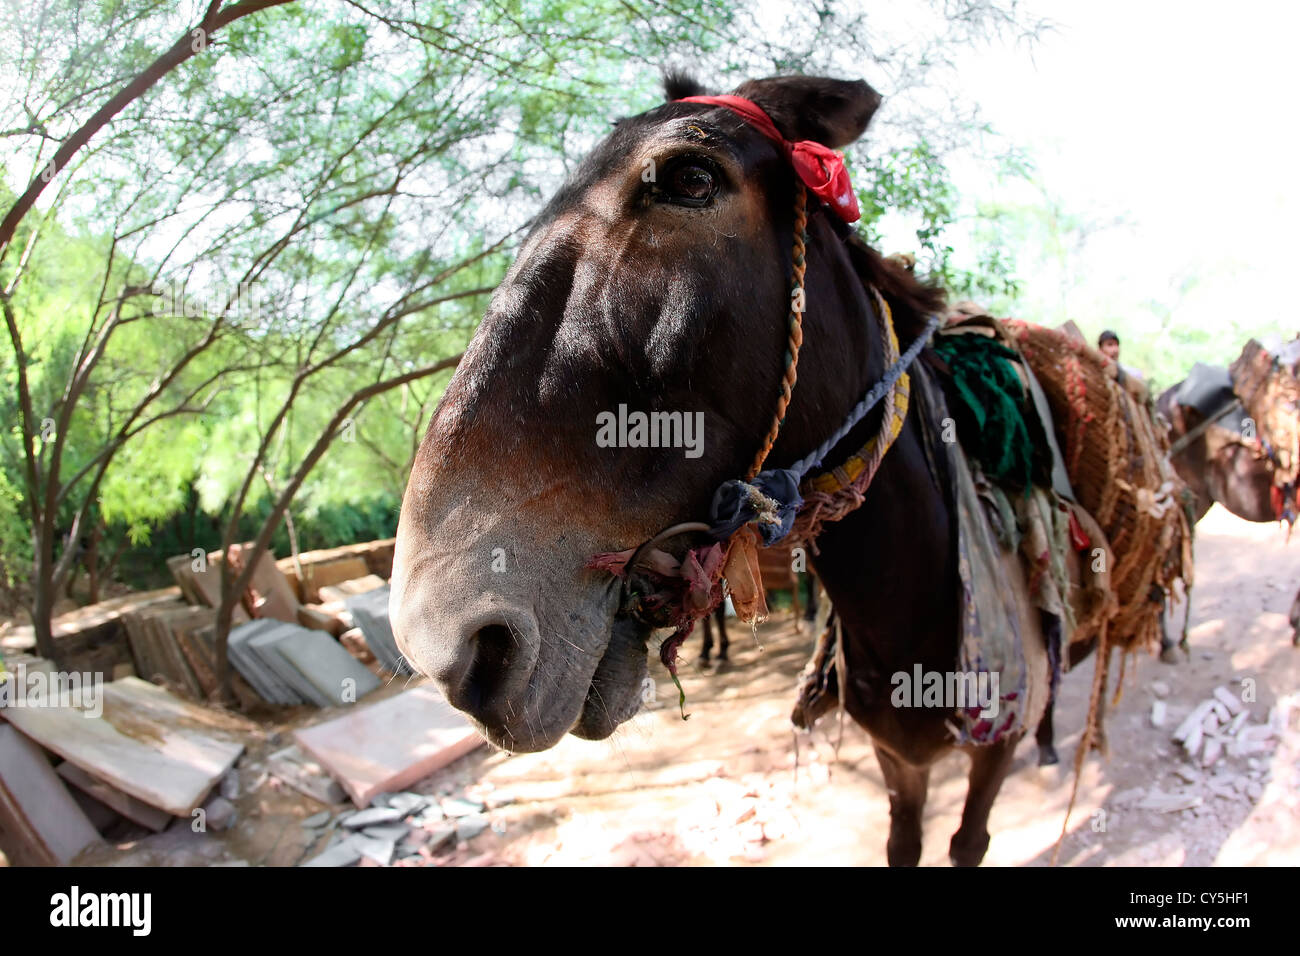 DONKEY,domesticated,animal,'beast of burden','draft animal','draft animalS' - Stock Image